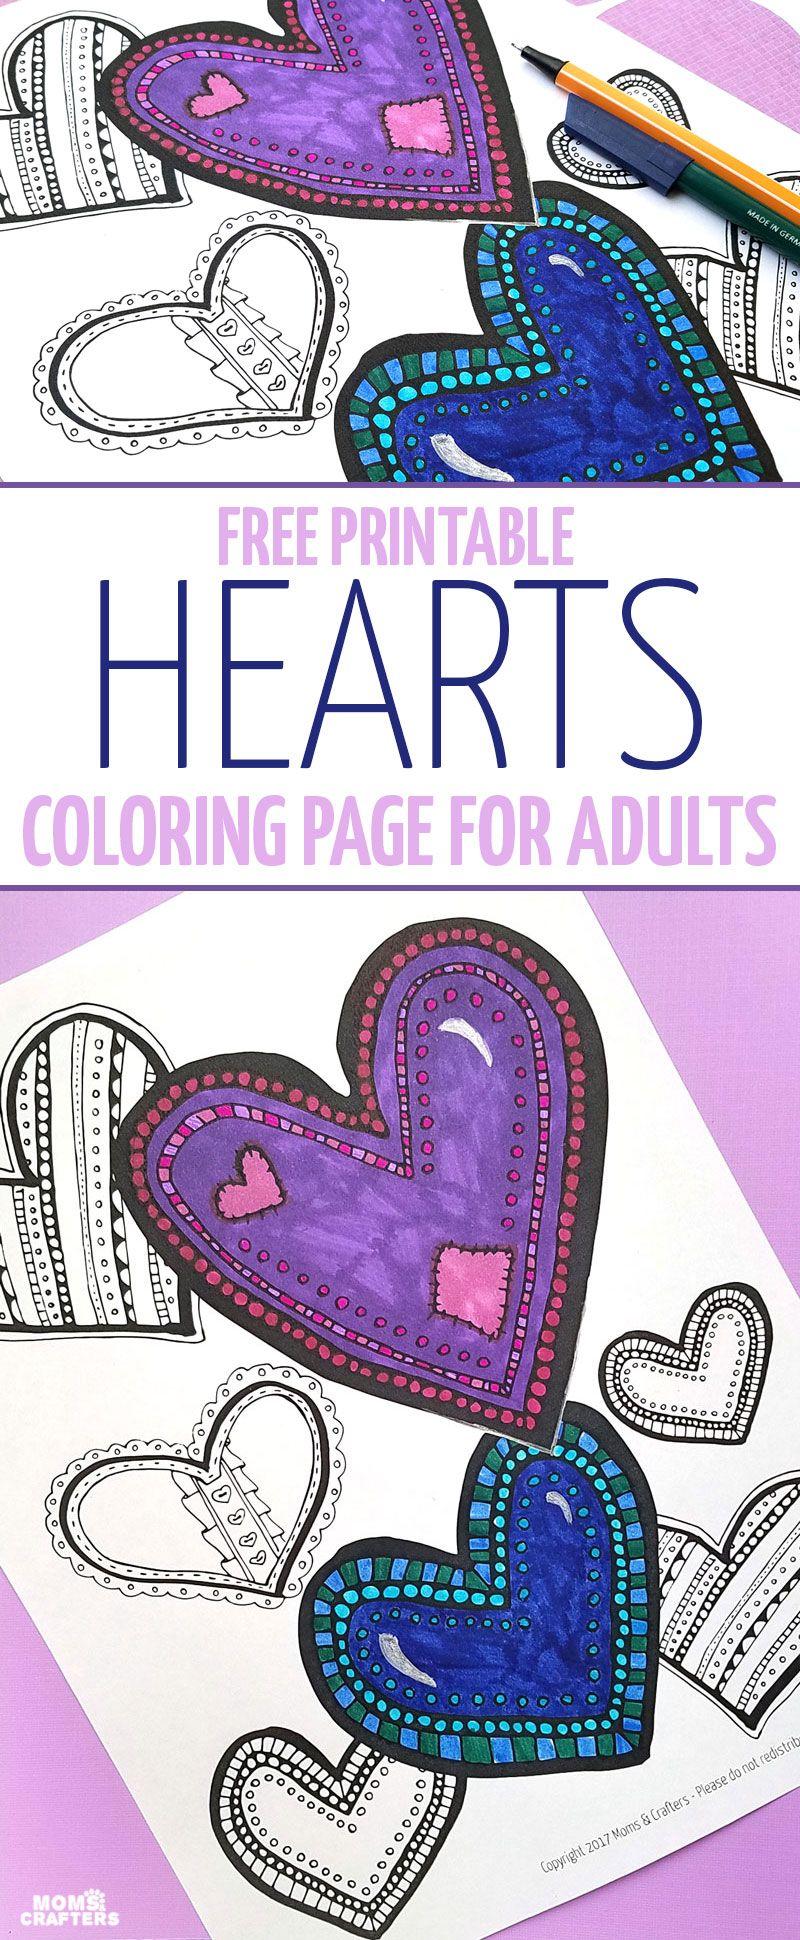 Free Printable HEARTS coloring page! | Valentinstag und Herzchen